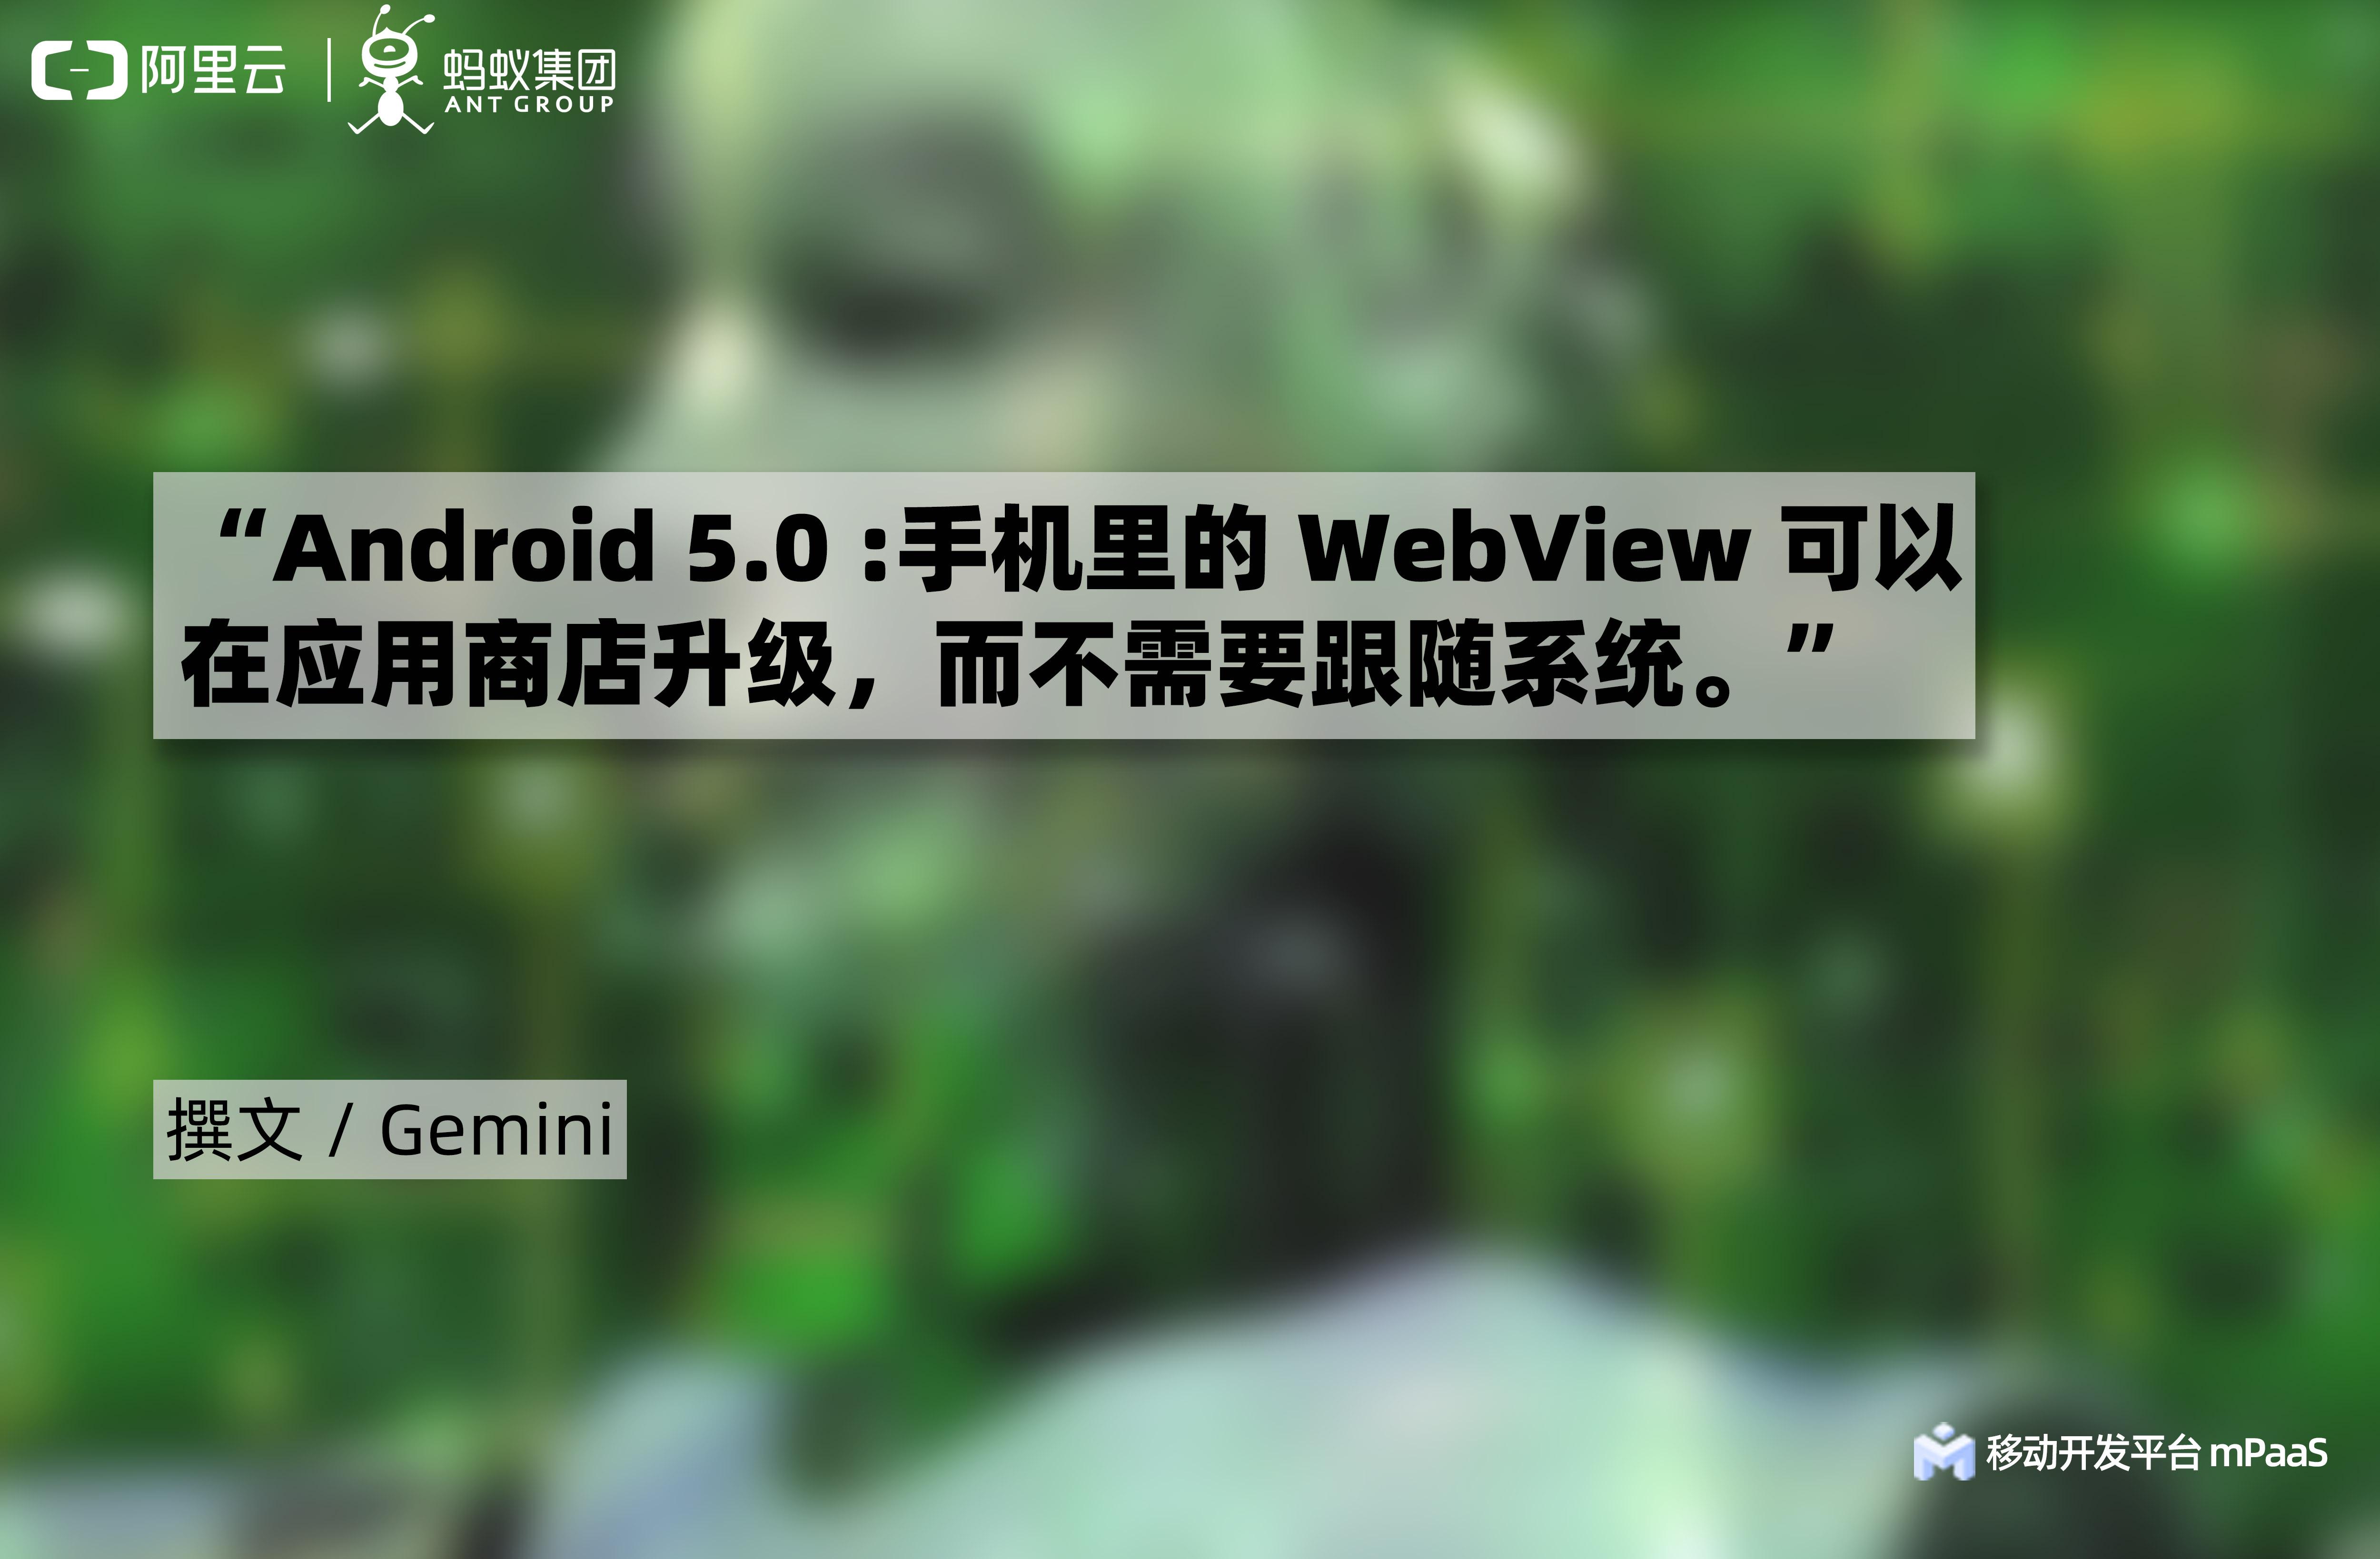 Webview.apk —— Google 官方的私有插件化方案1